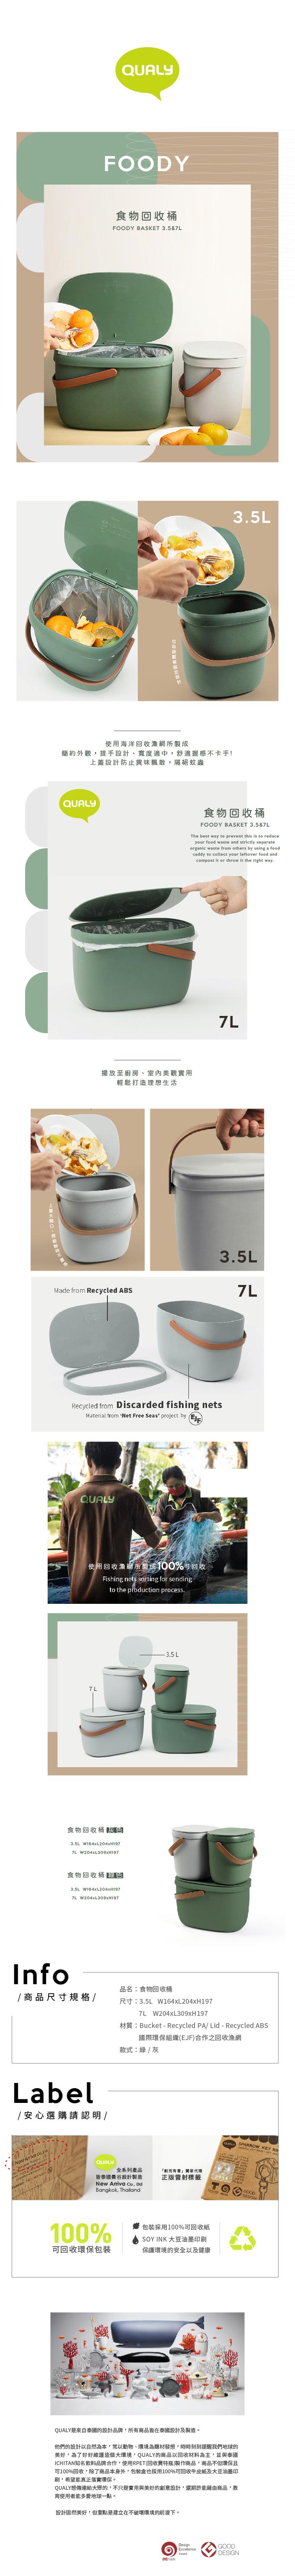 QUALY 食物回收桶3.5L